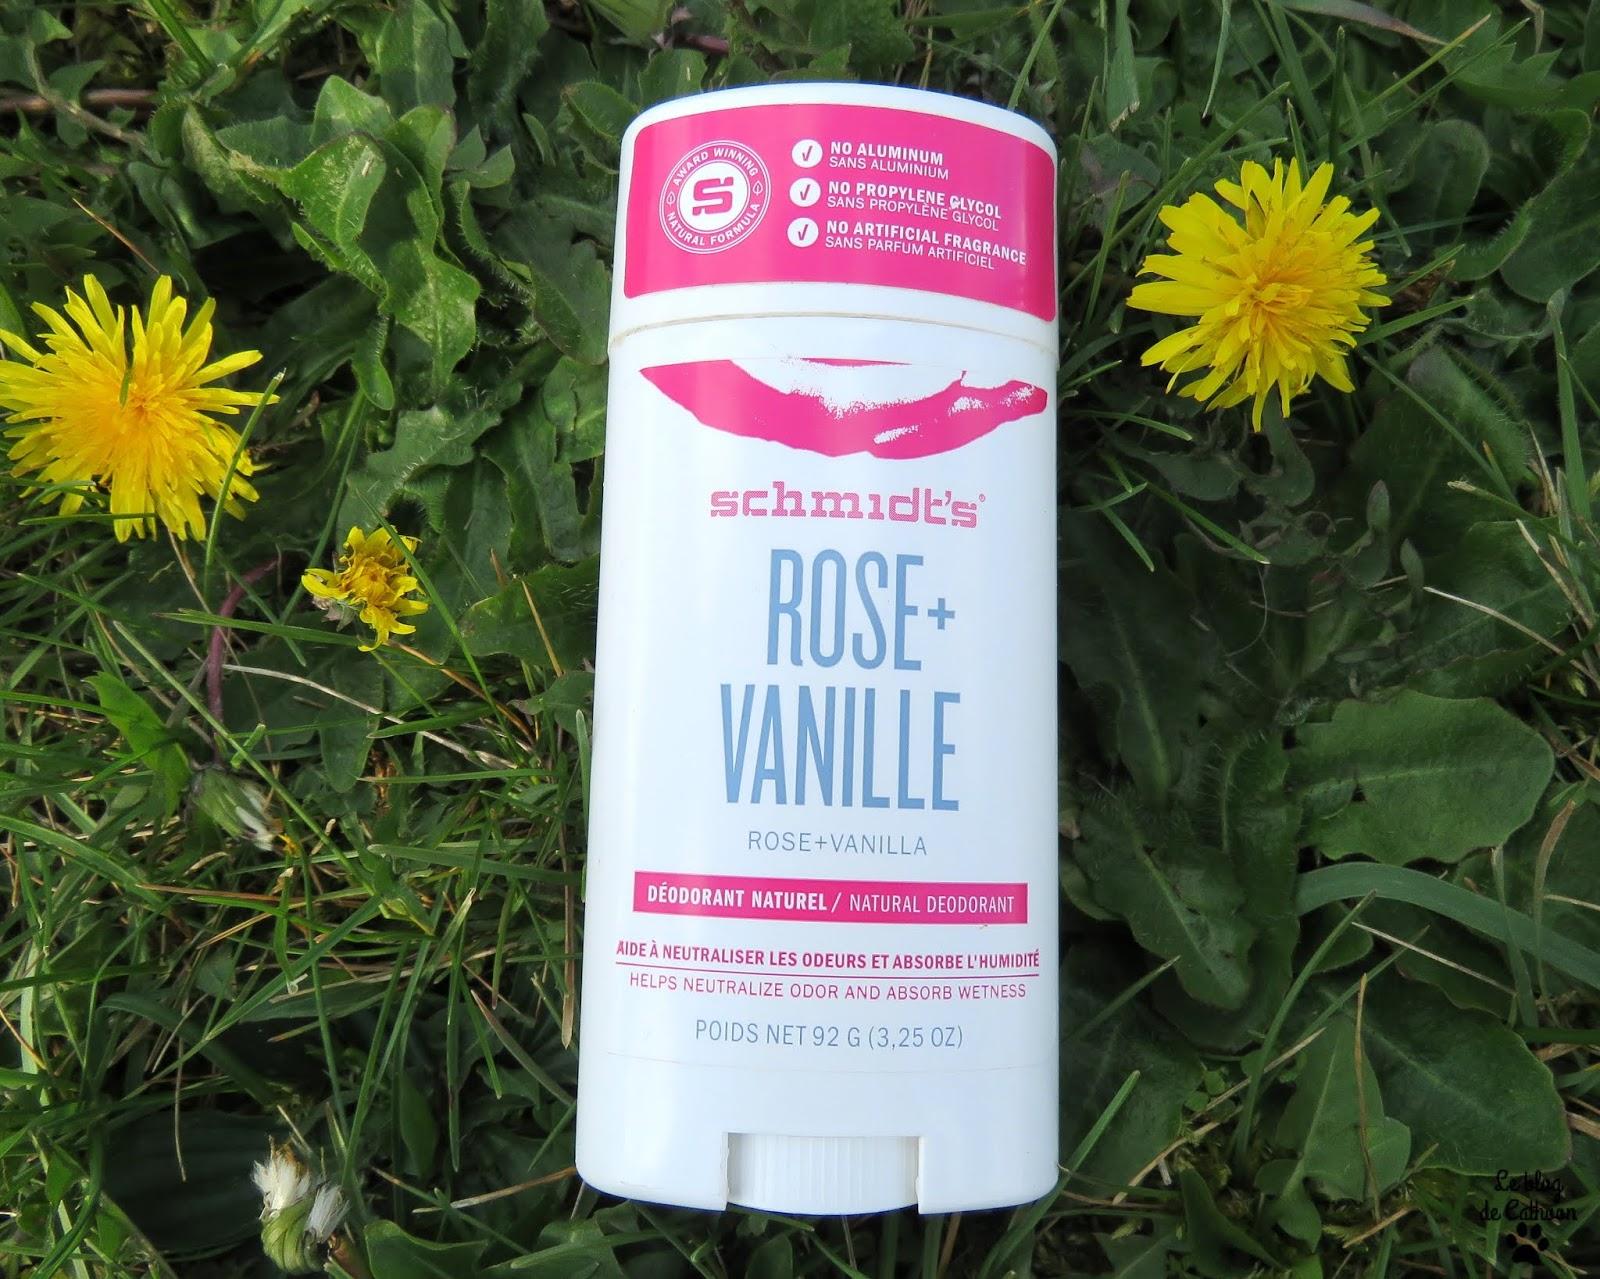 Rose + Vanille Déodorant Schmidt's